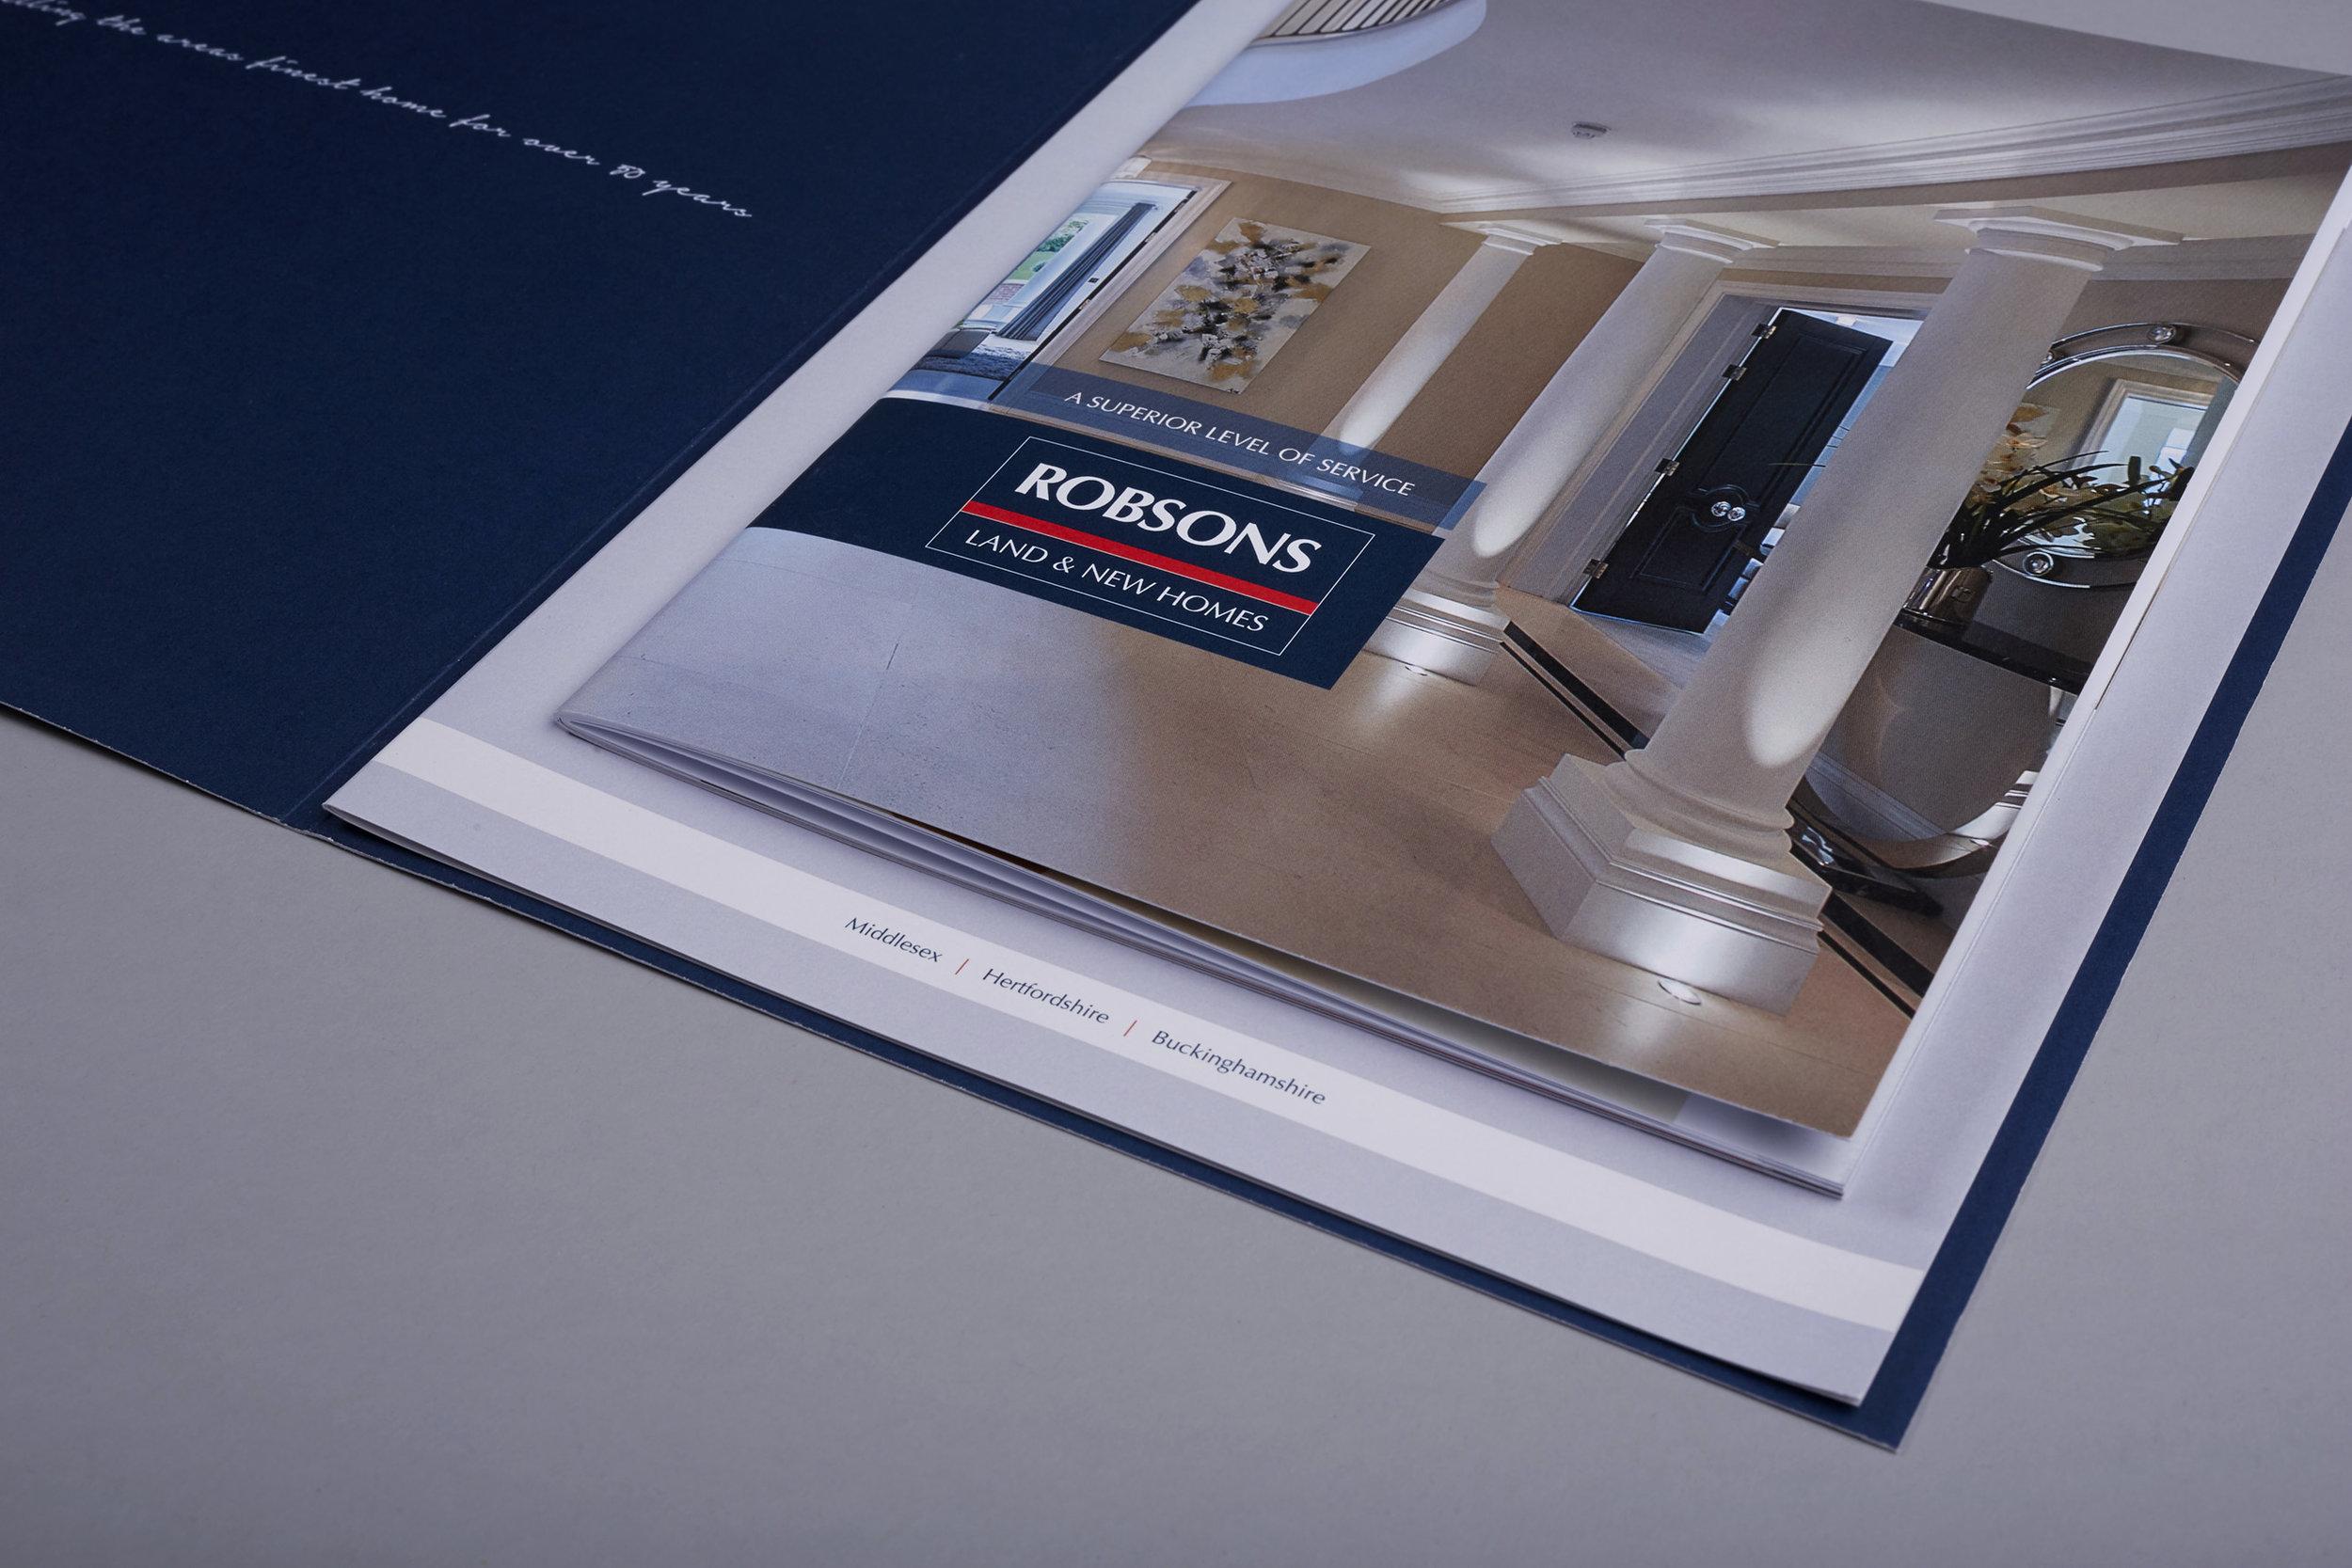 Splendid Design Robsons Brochure Design.jpg